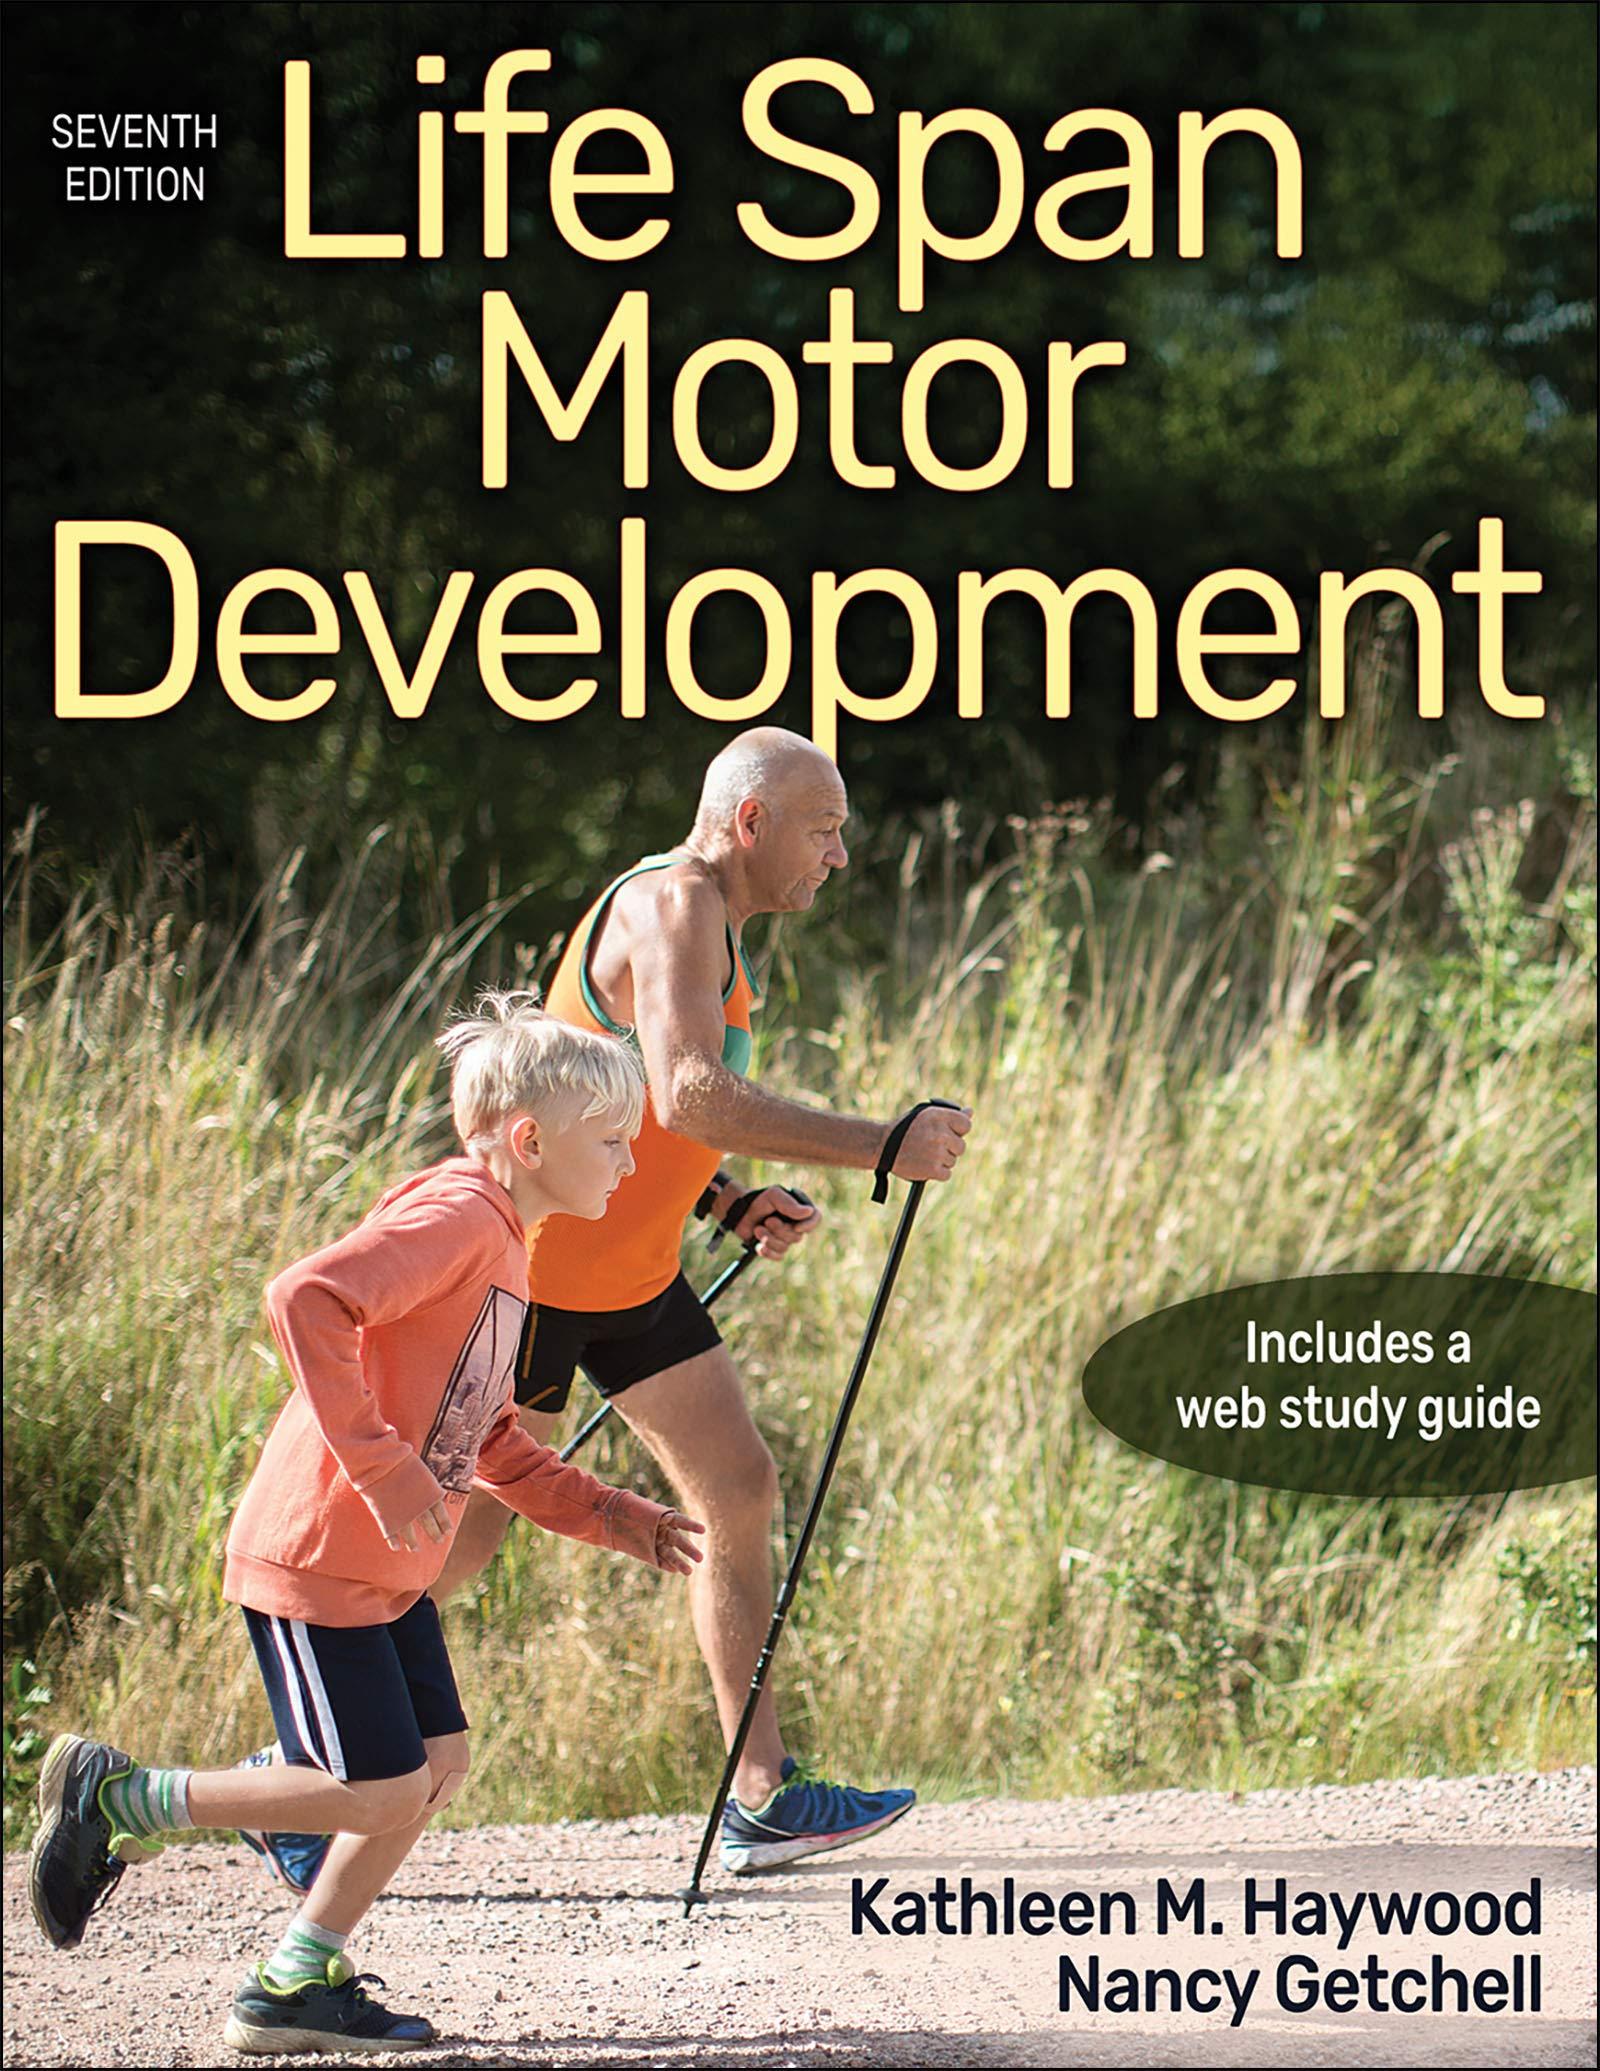 Lifespan Development 7th Edition Pdf Free